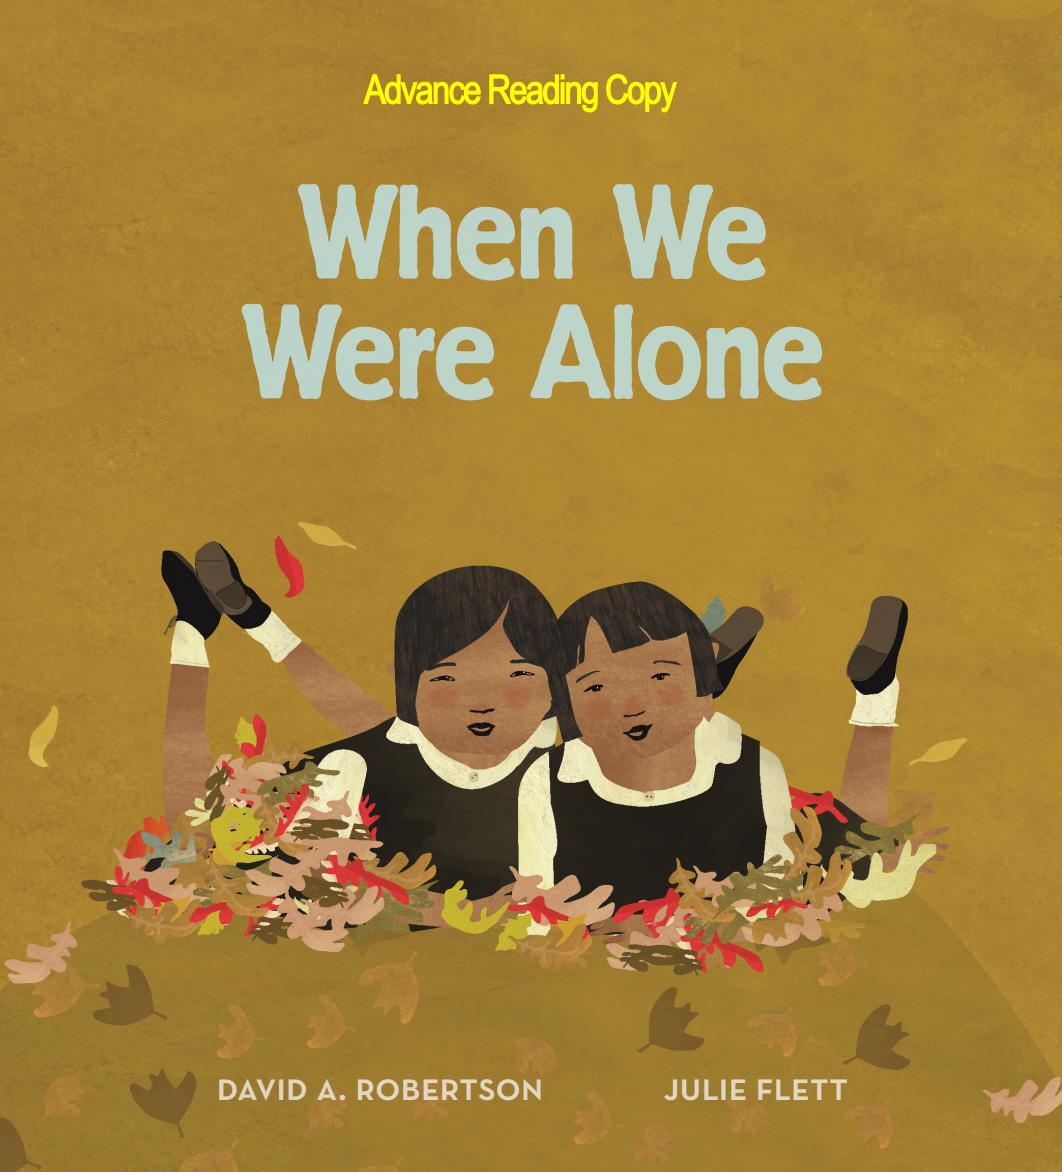 American Indians in Children's Literature (AICL): Top Board Books